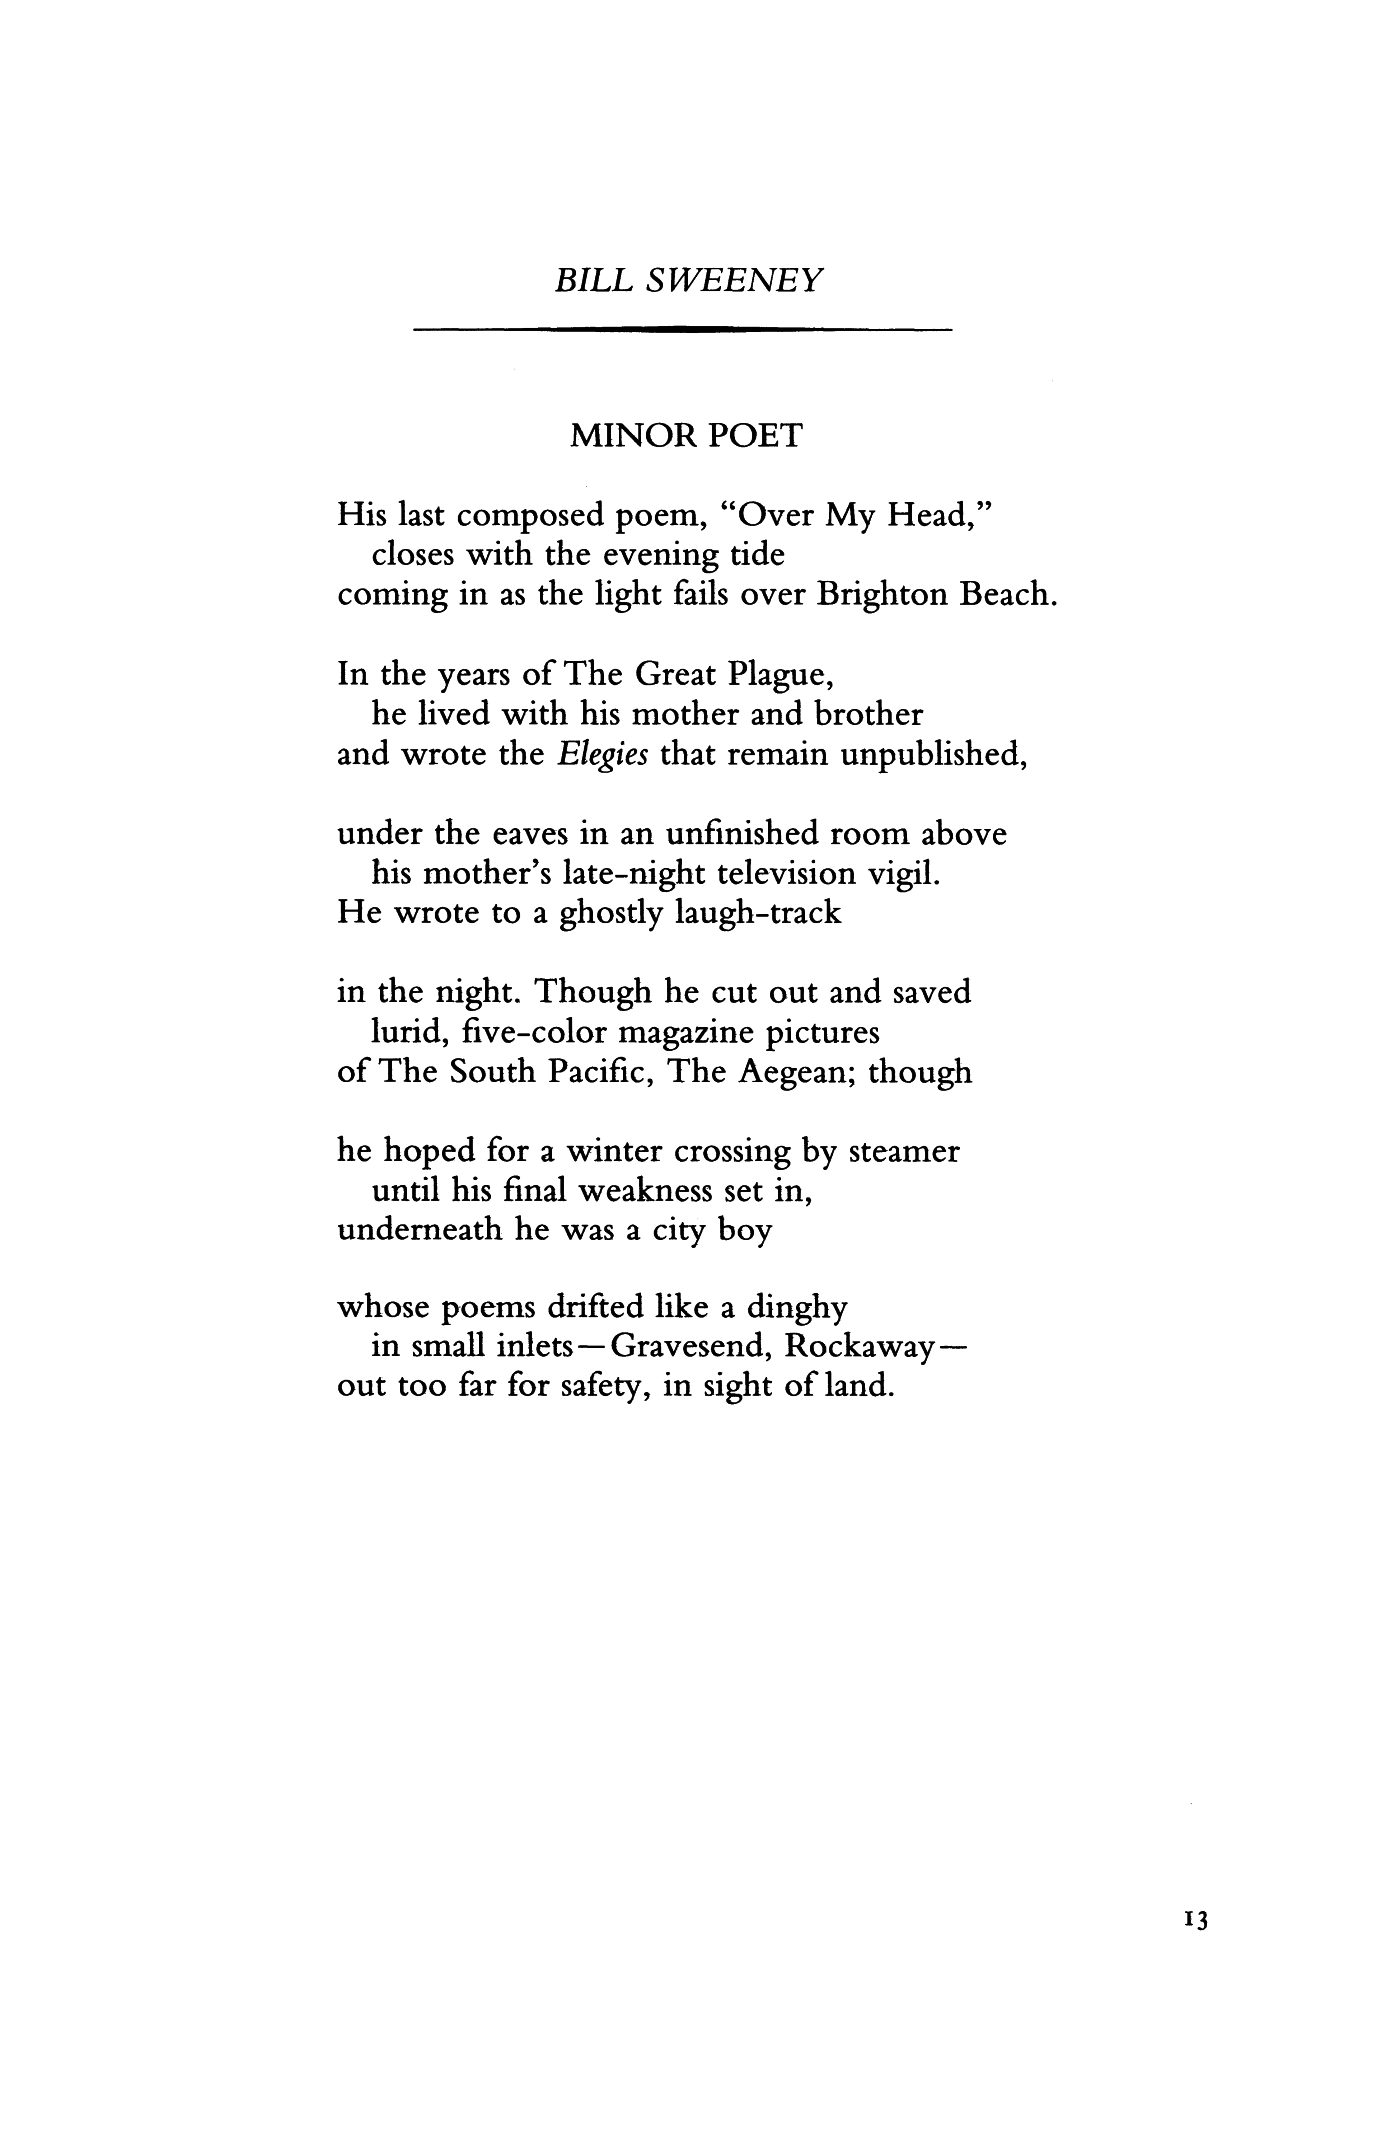 Minor Poet by Bill Sweeney | Poetry Magazine